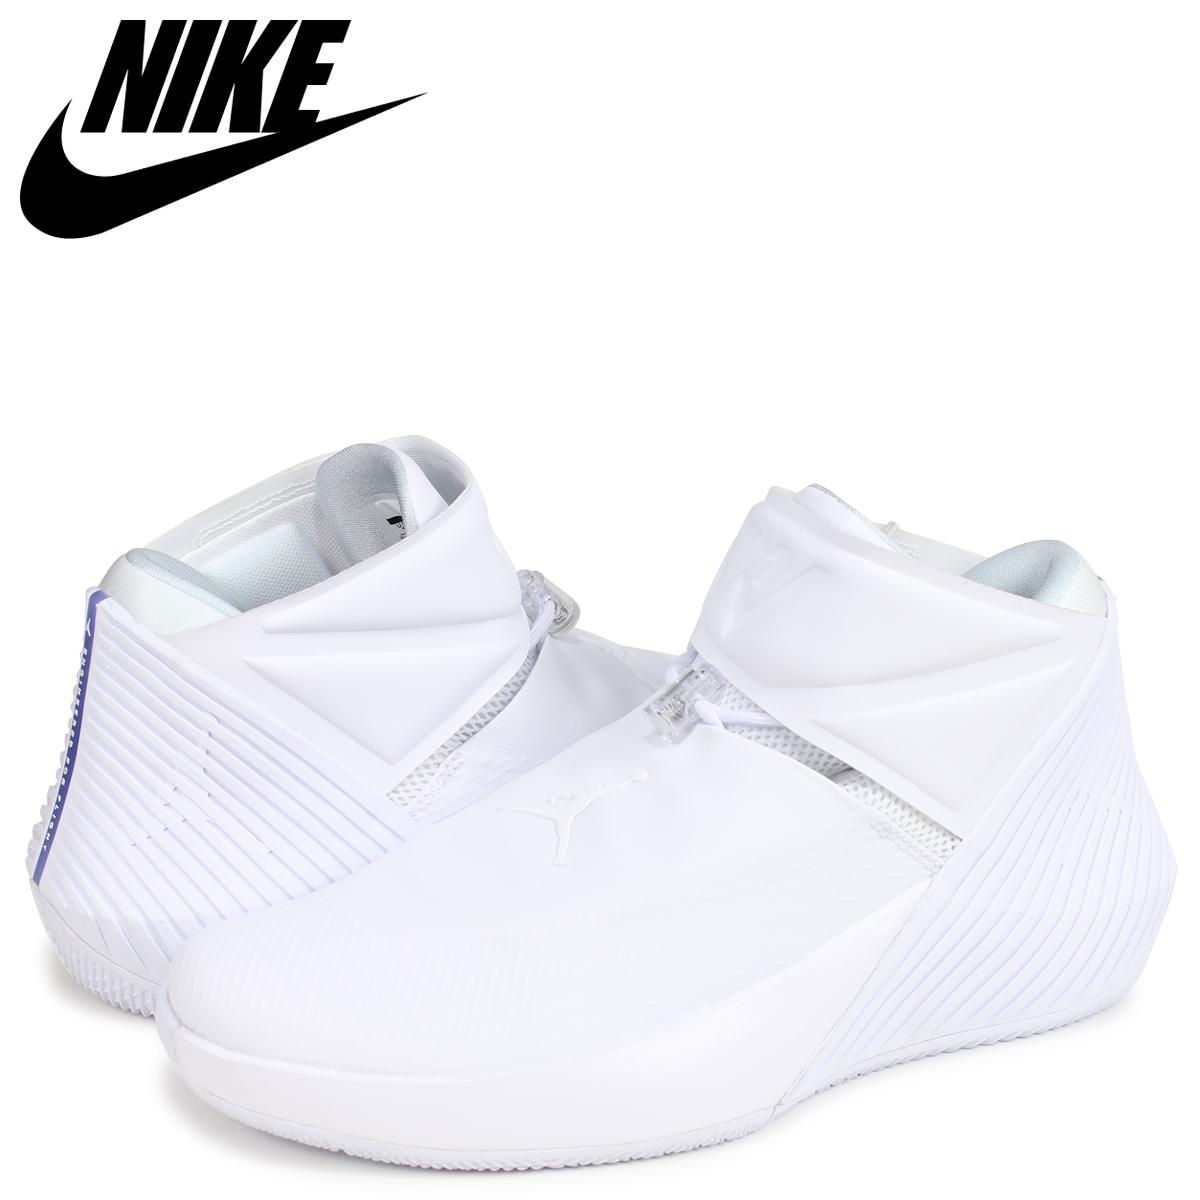 cheaper d59e2 512ab ... free shipping nike nike air jordan sneakers men jordan why not zer0.1  pfx aq9028